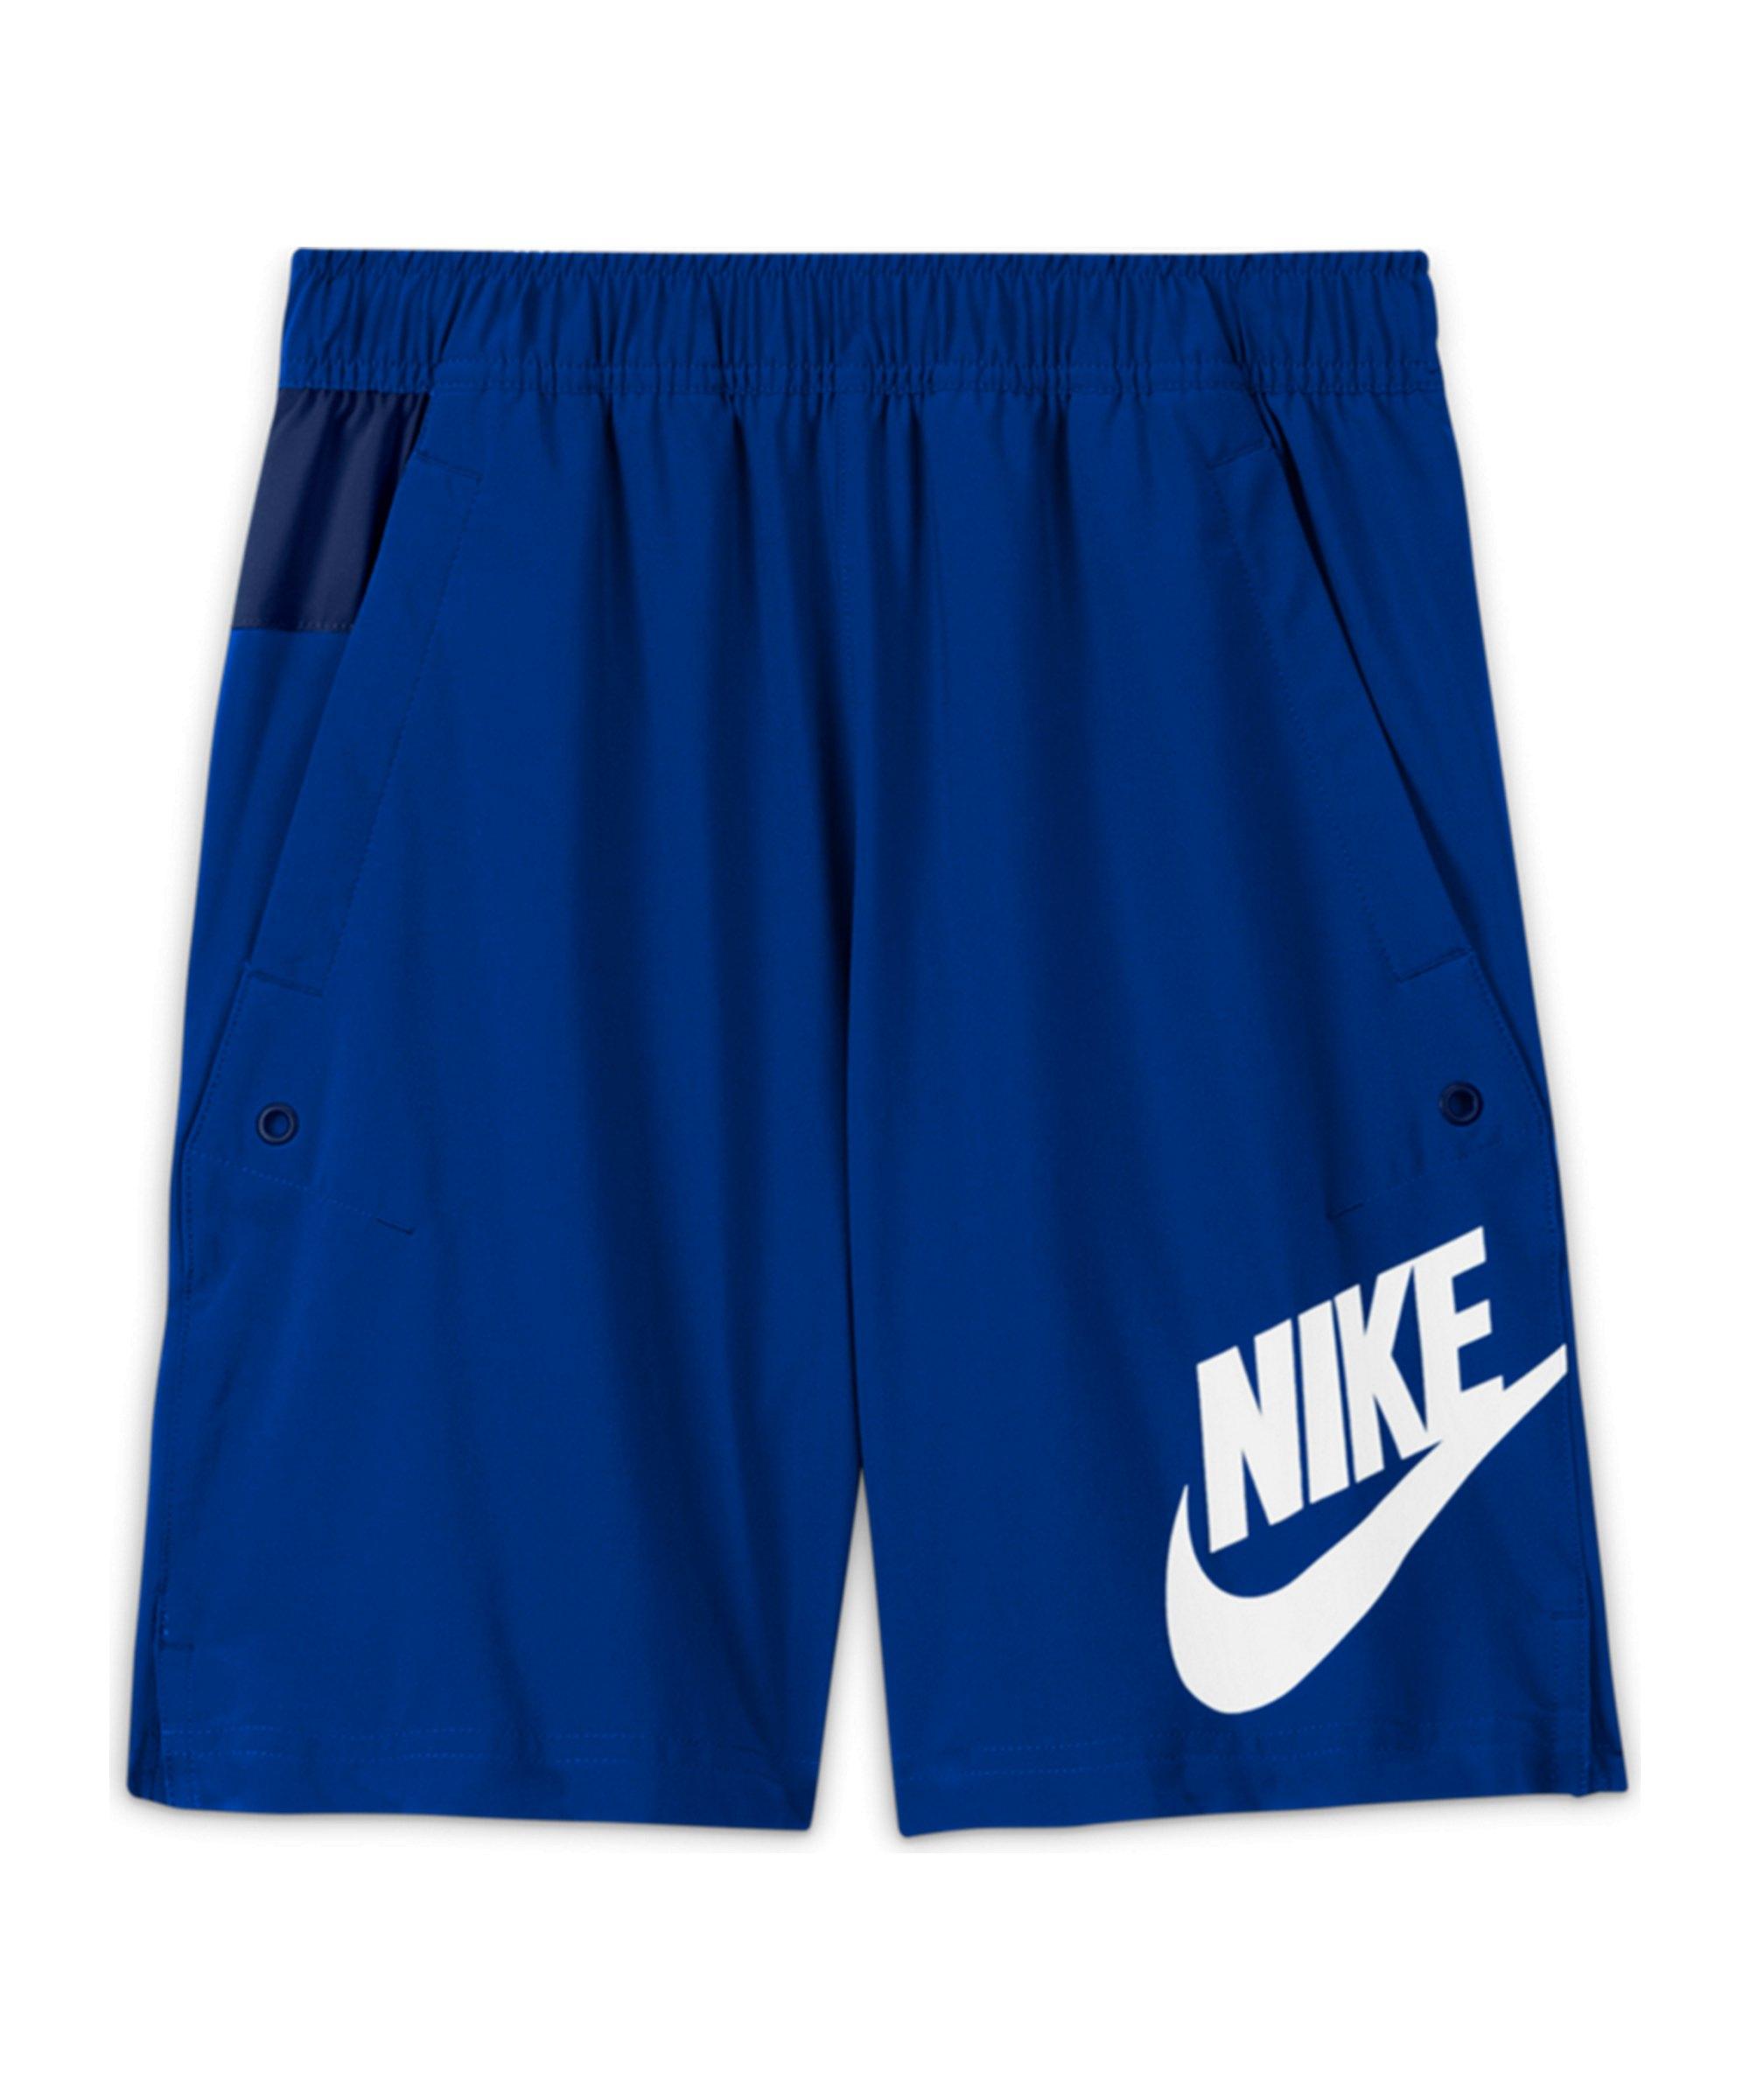 Nike Woven HBR Short Kids Blau F480 - blau